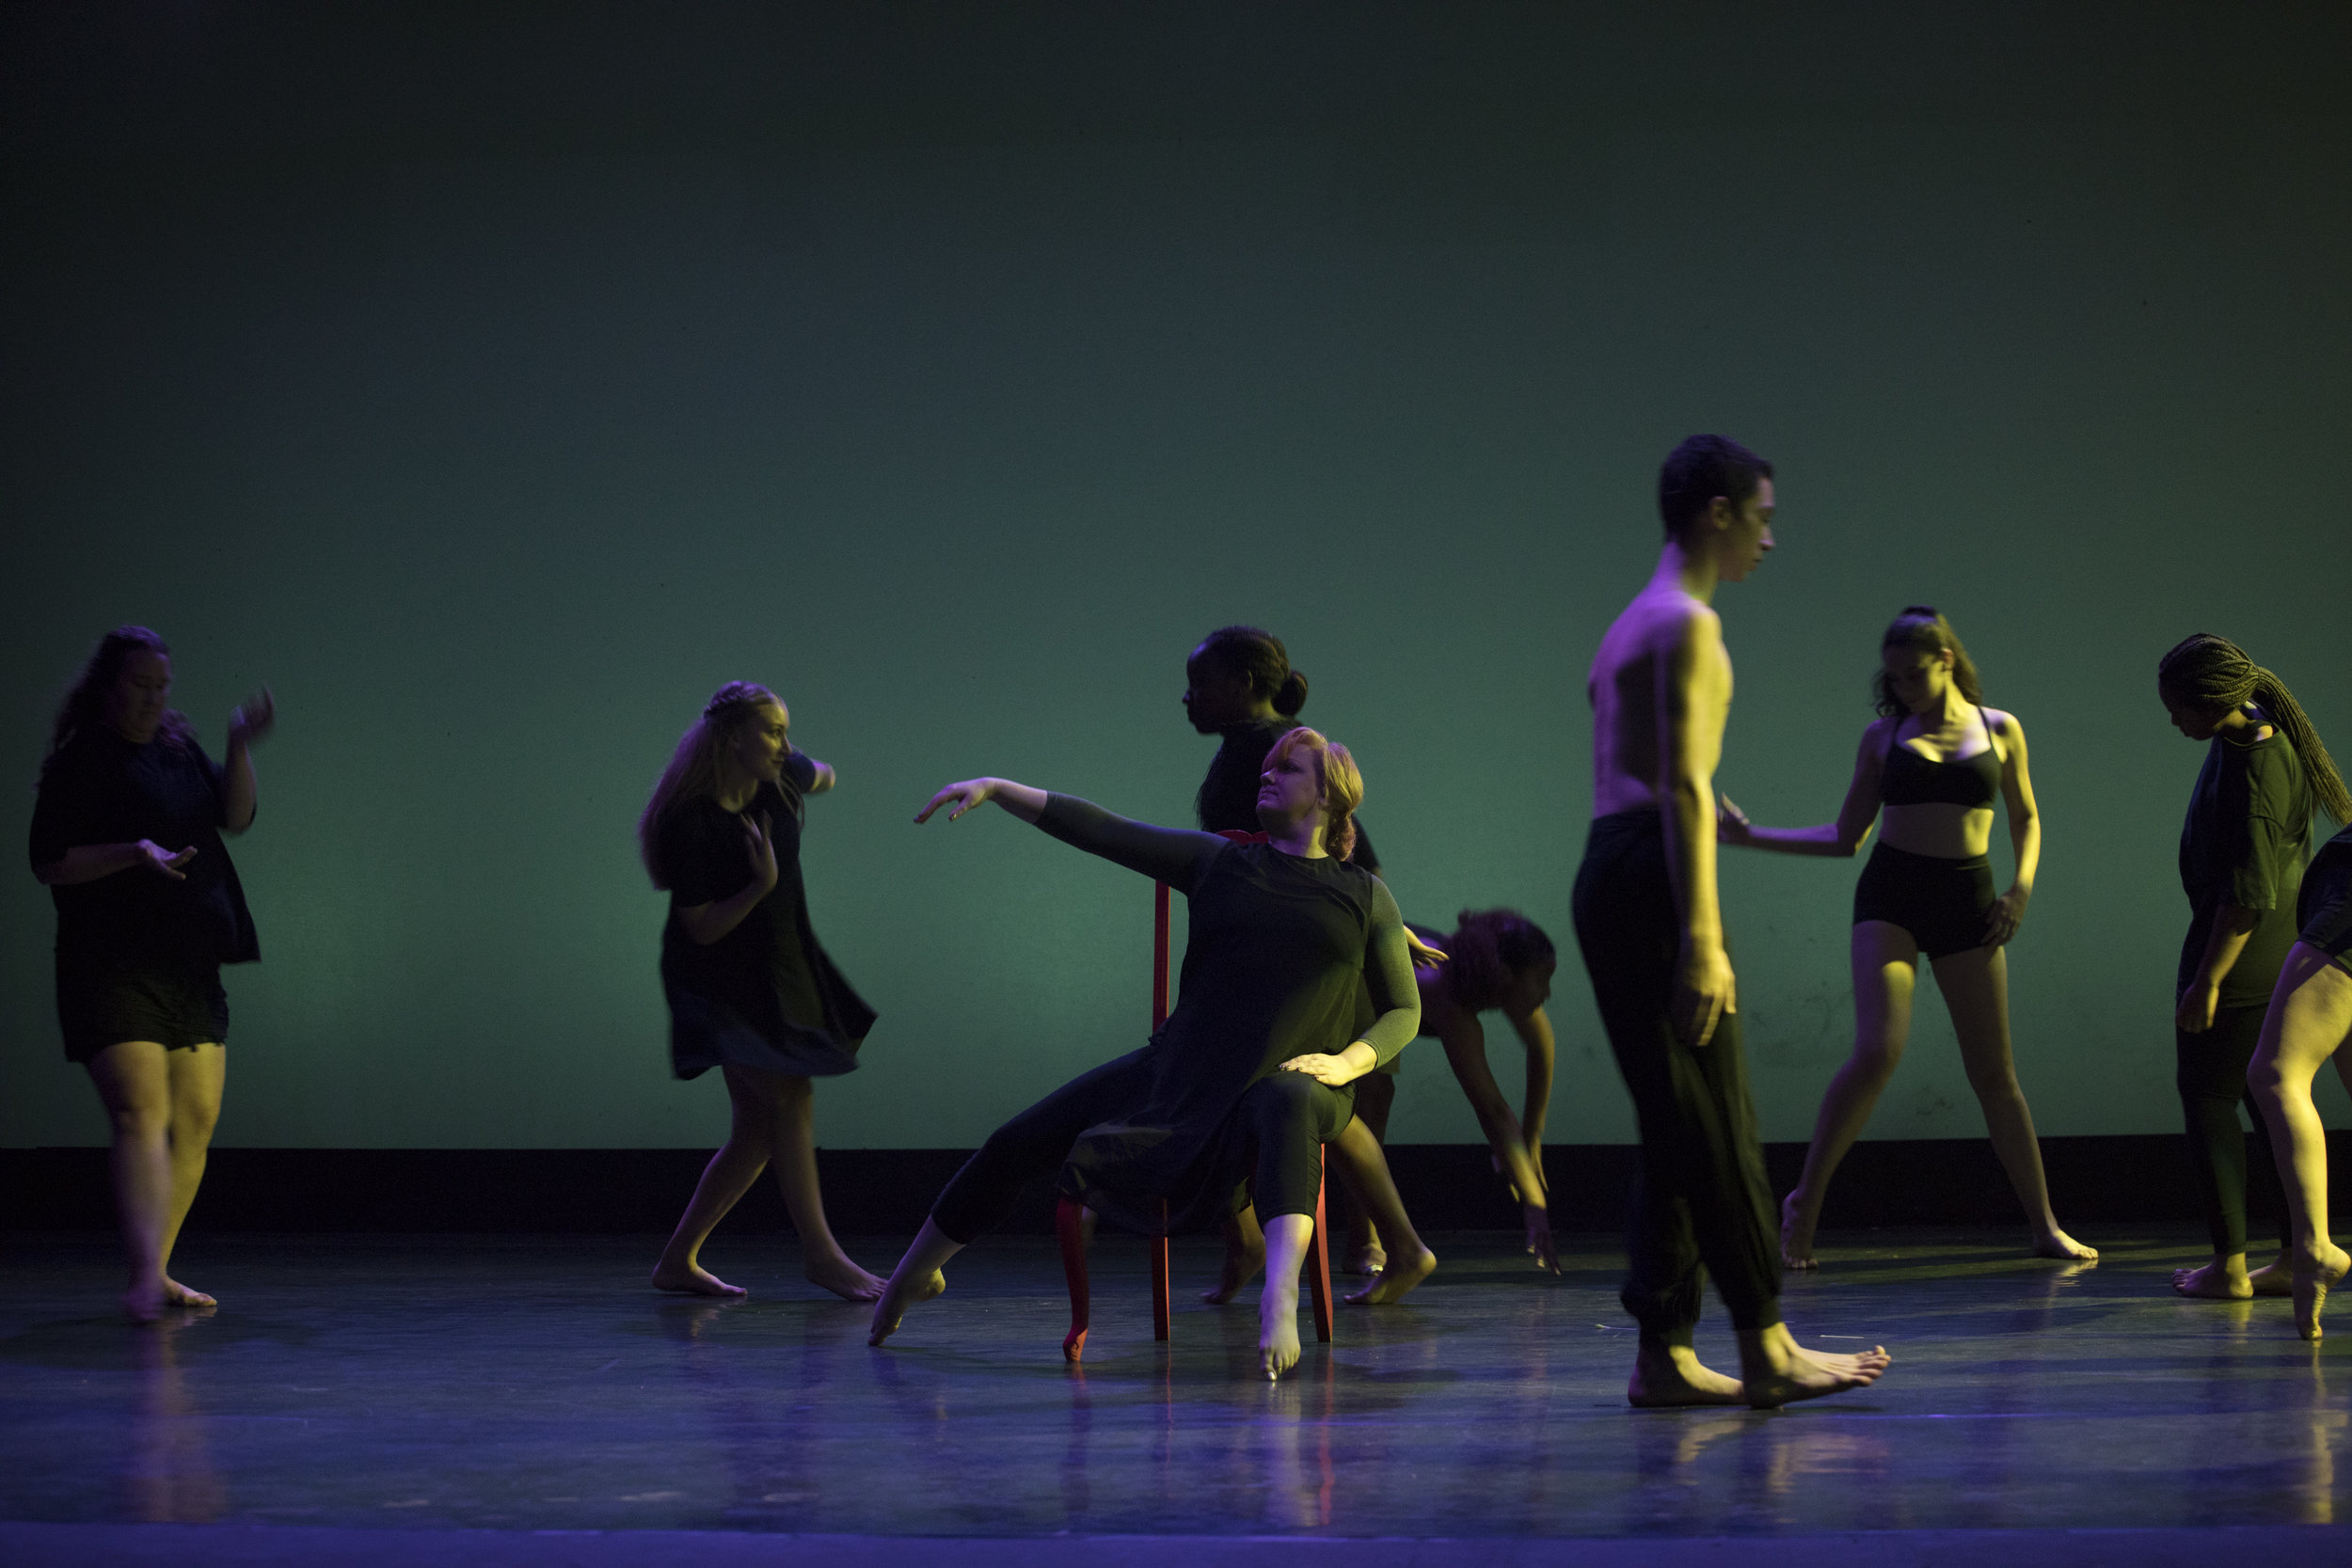 Dance Show by Jehanne-Marie Milne-119.jpg